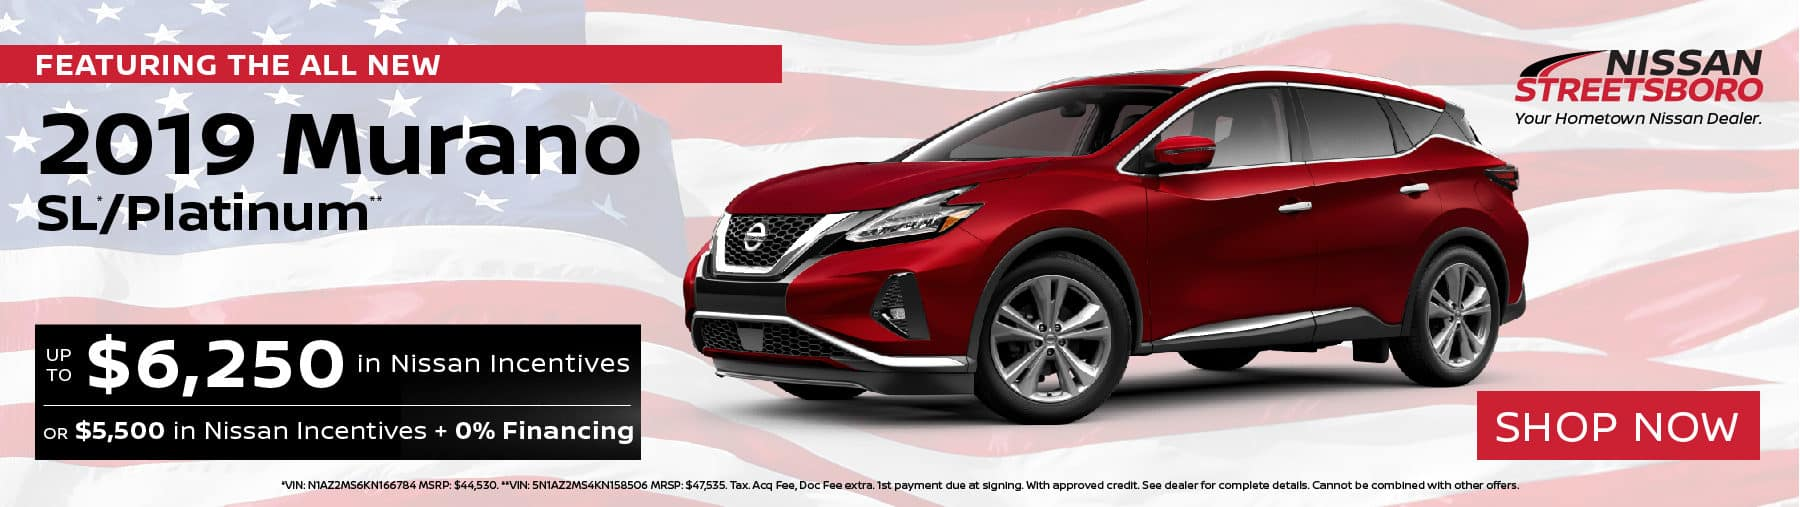 2019 Nissan Murano Incentives